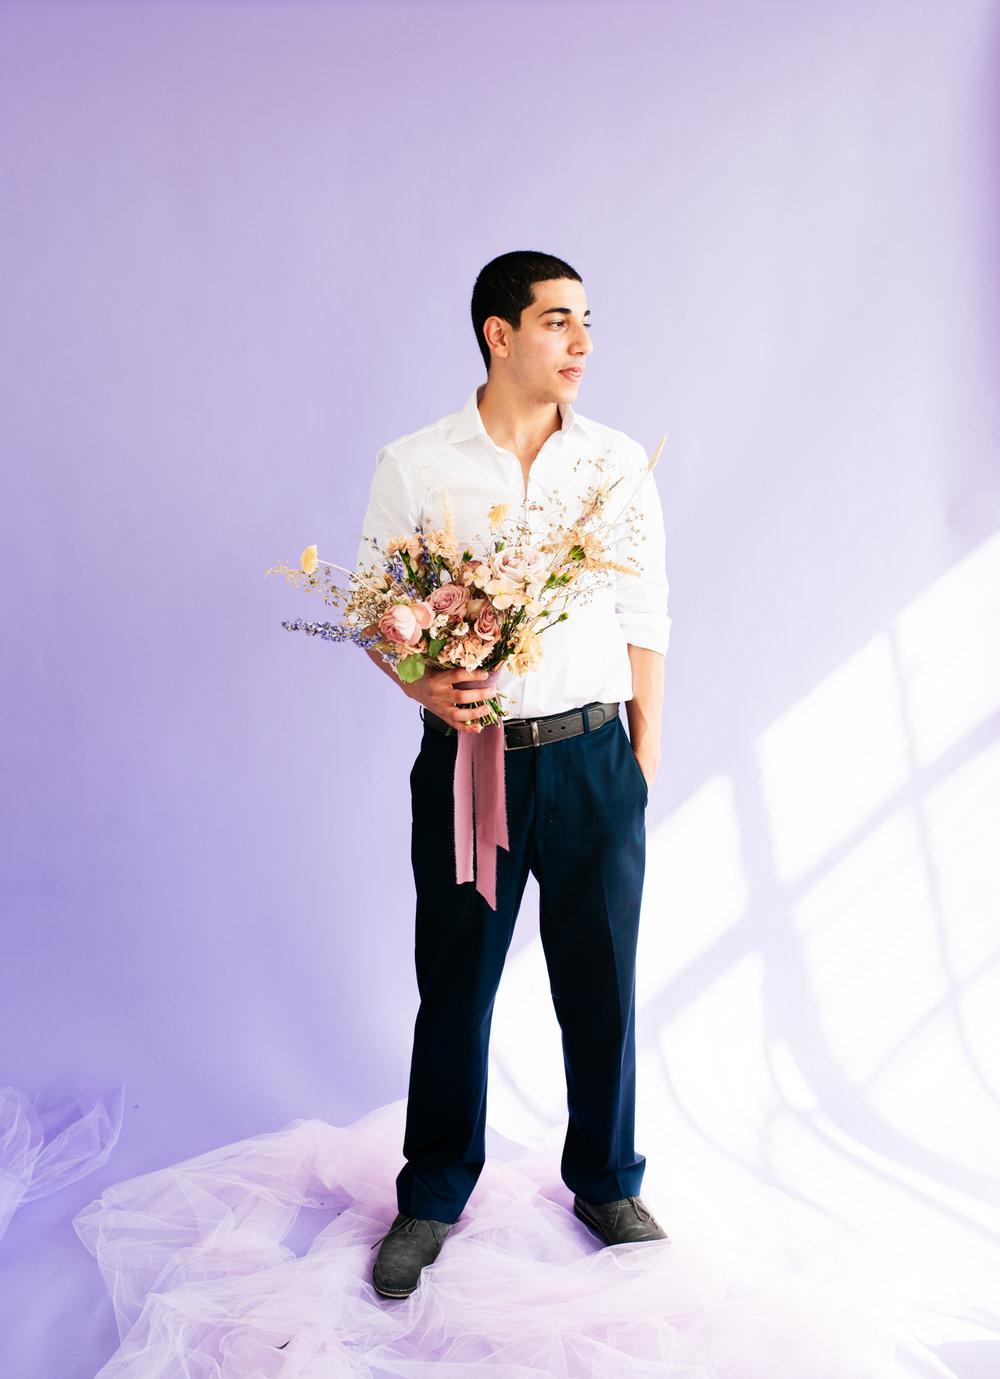 SamErica Studios - Lavender Lemonade Modern Bridal Editorial -52.jpg